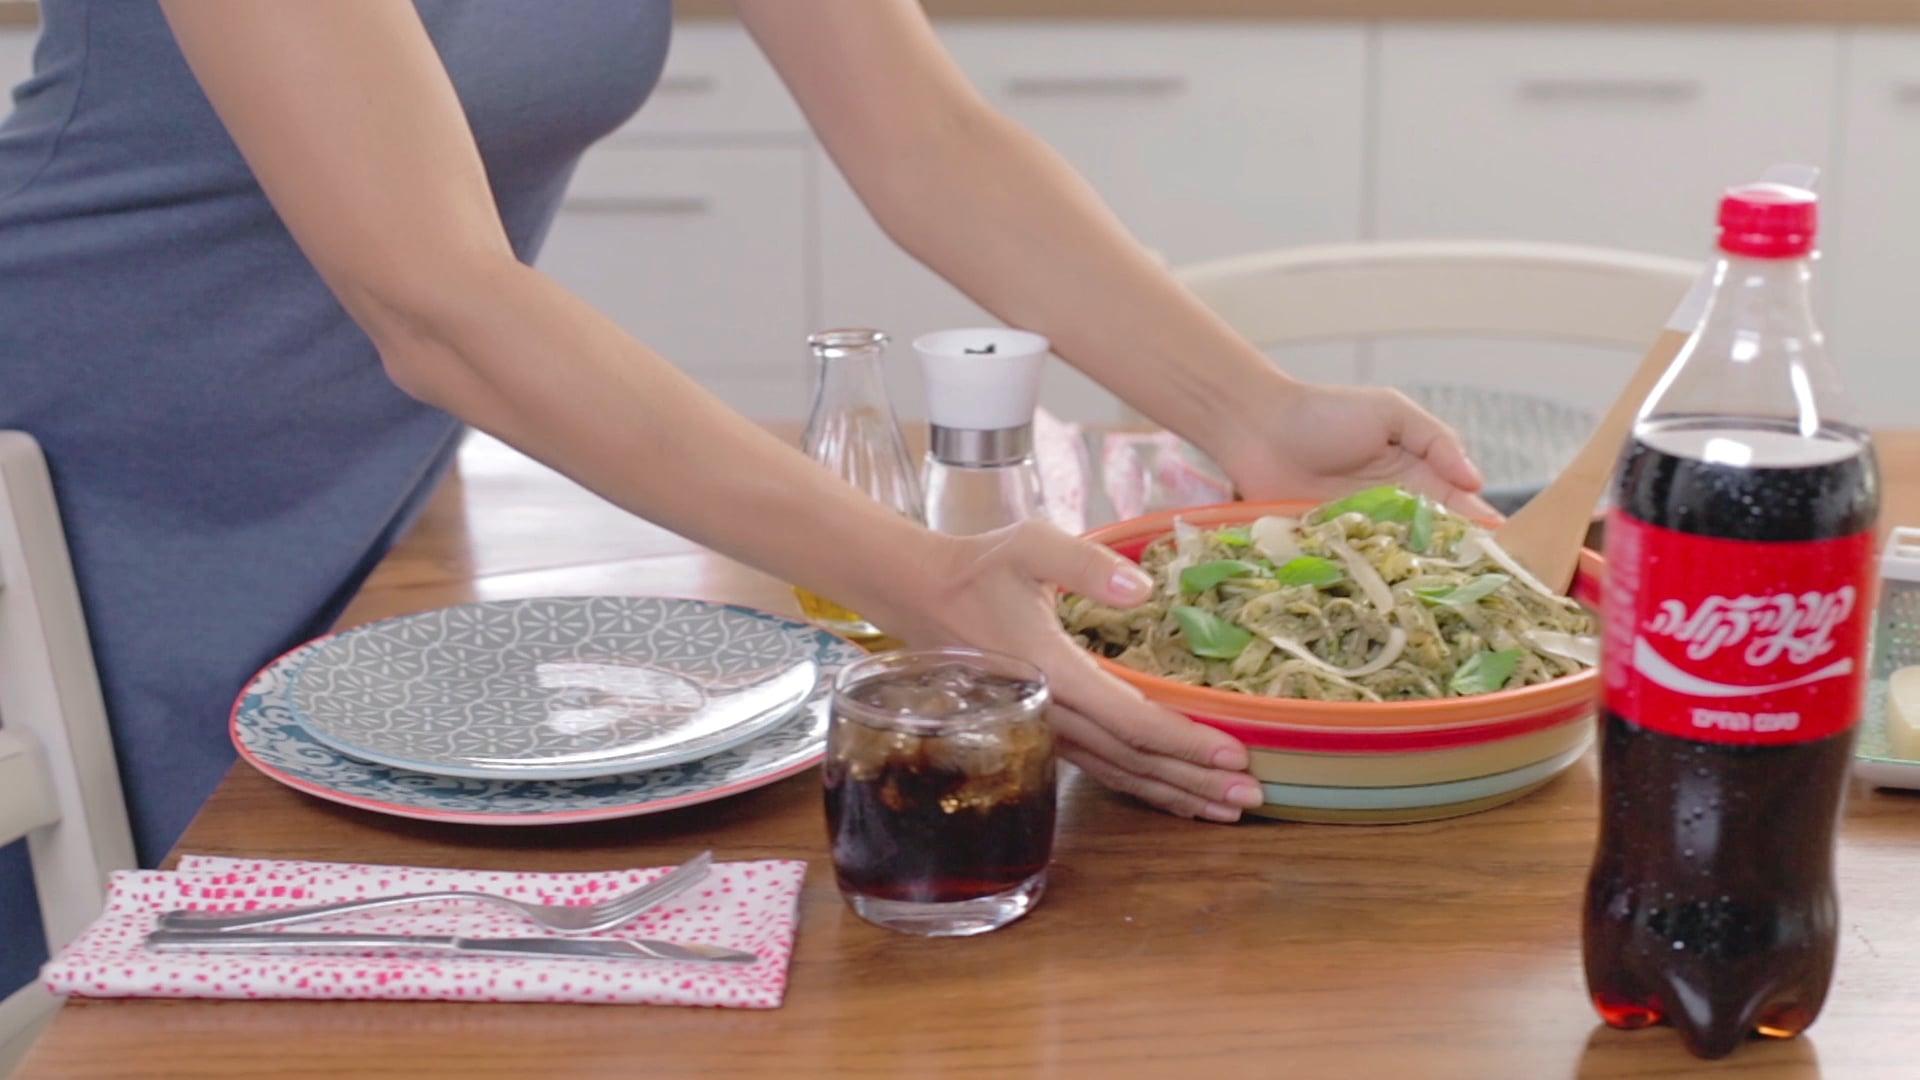 Coke & Meal PASTA recipe